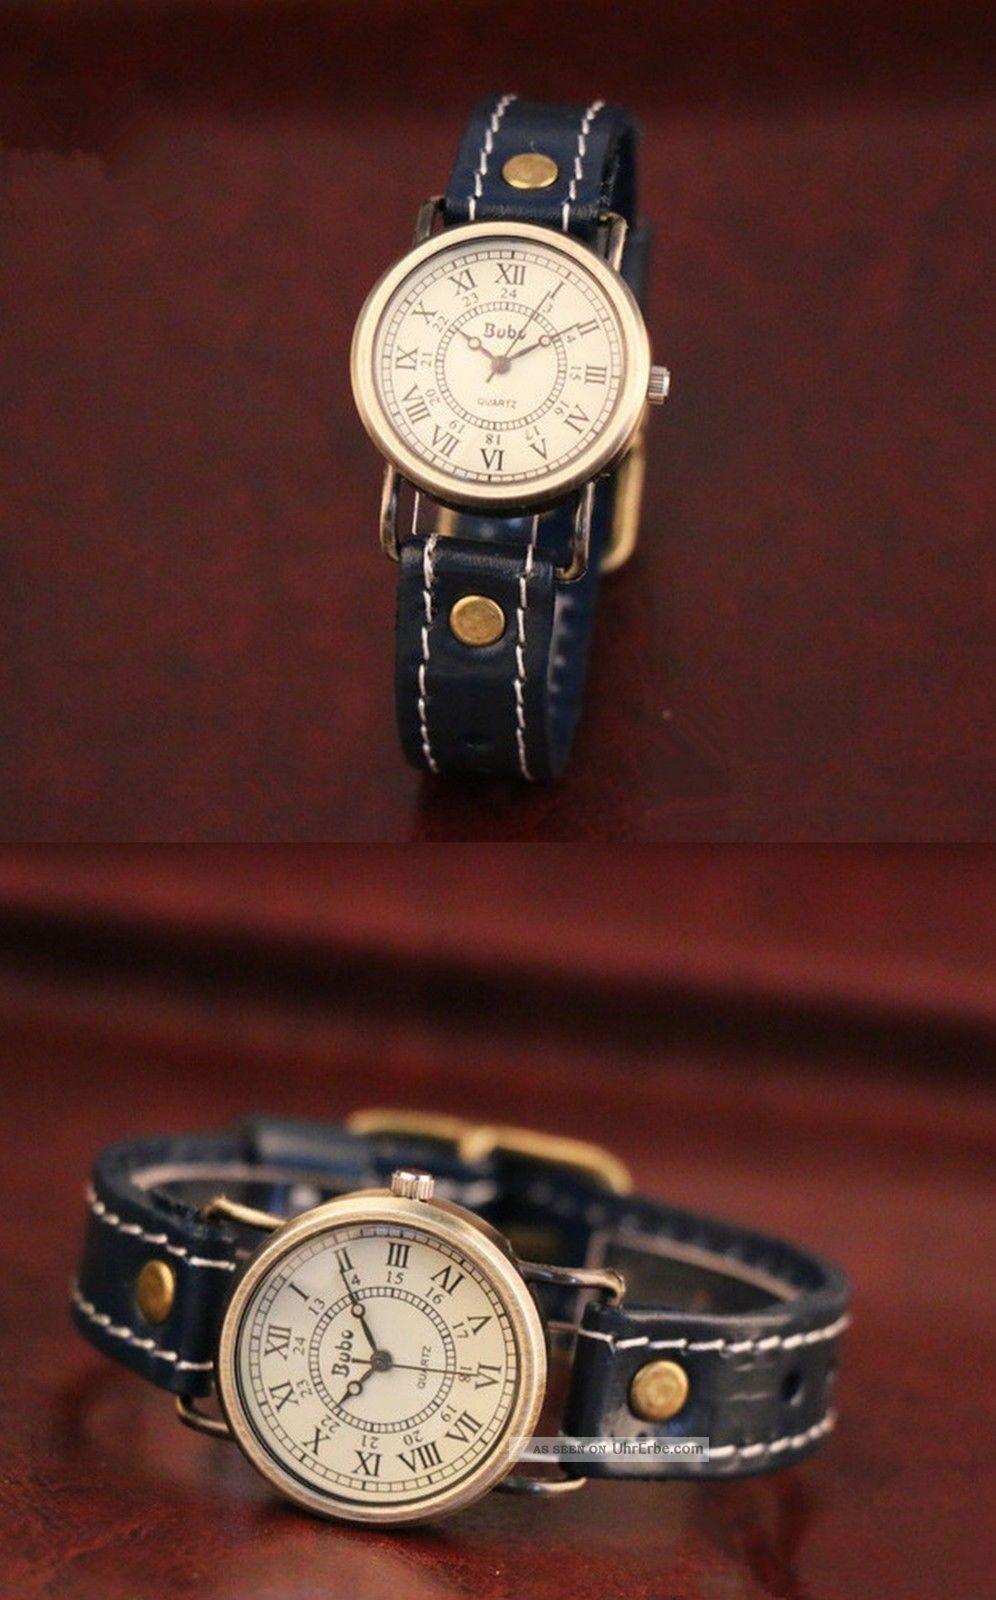 Herren Uhr Damen Armbanduhr Lederarmbanduhr Watch Analog L.  24cm Armbanduhren Bild